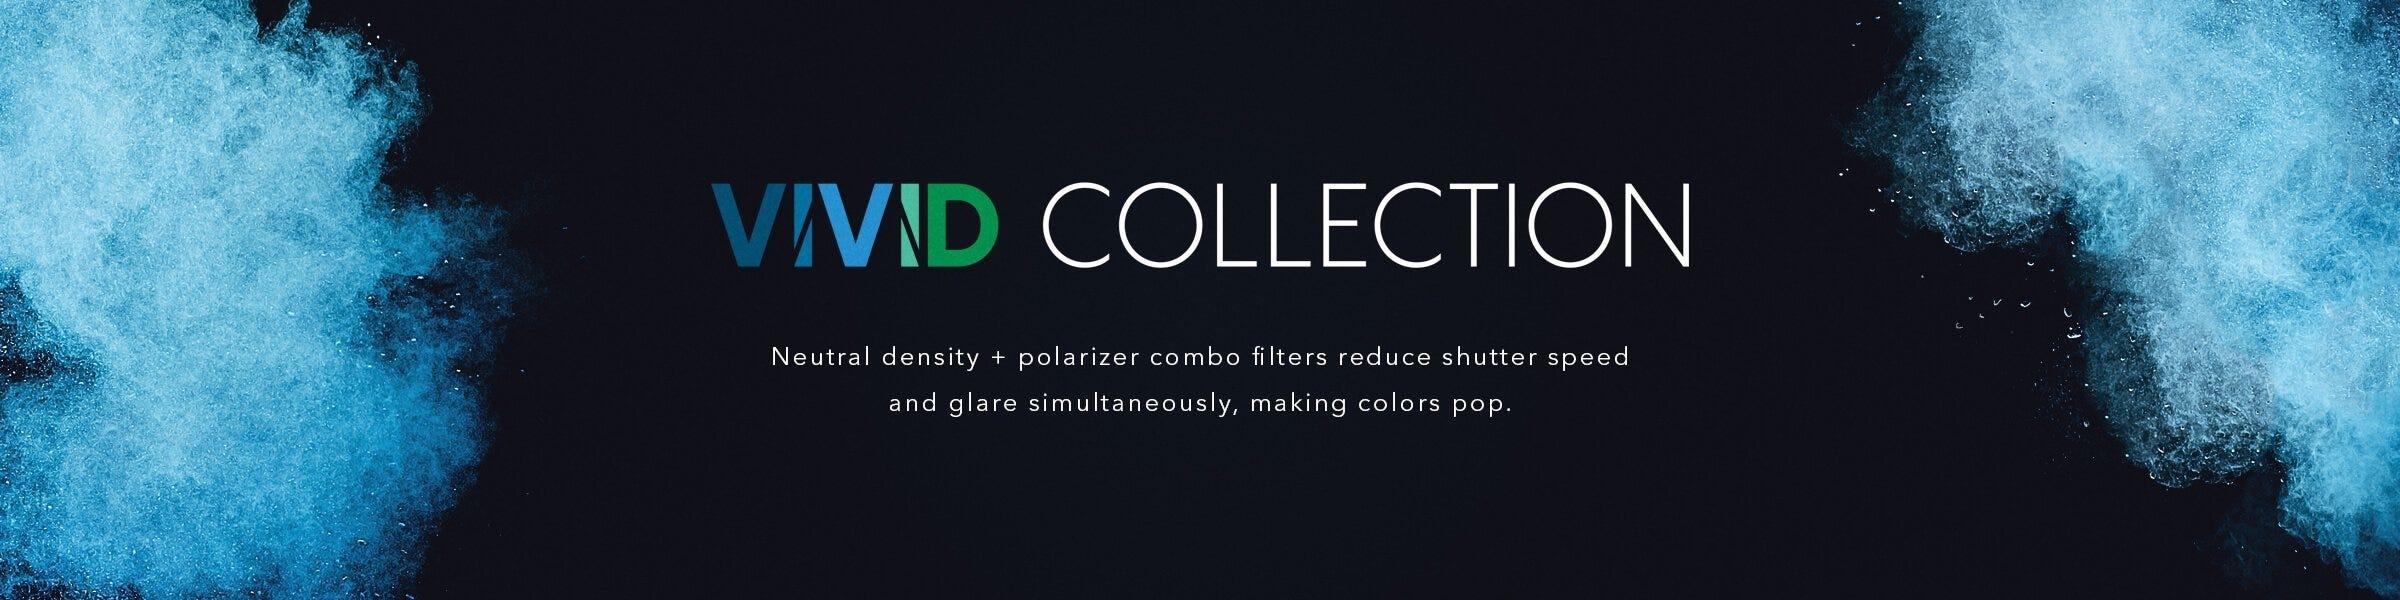 Polar Pro Mavic Air Filters